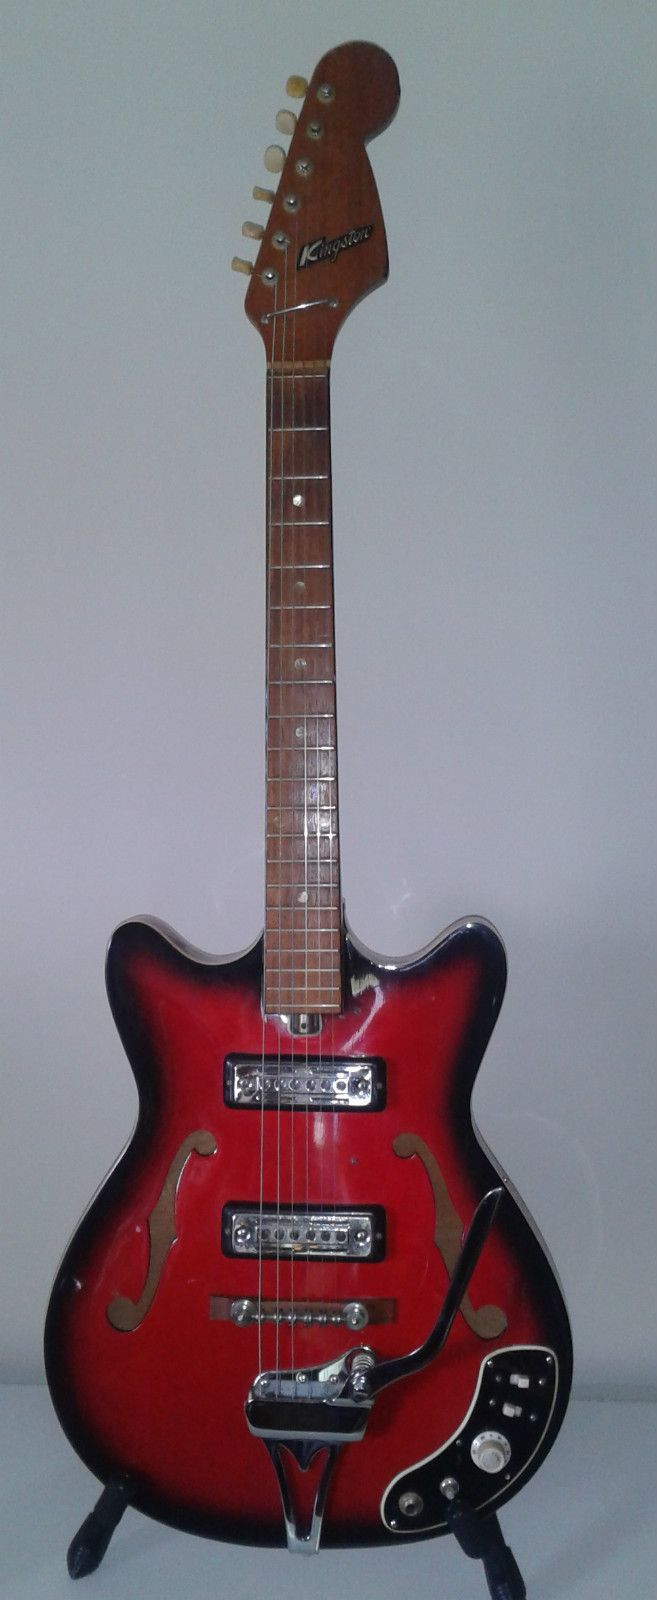 Details about VINTAGE 80's Vantage 118T Solid Body Electric Guitar